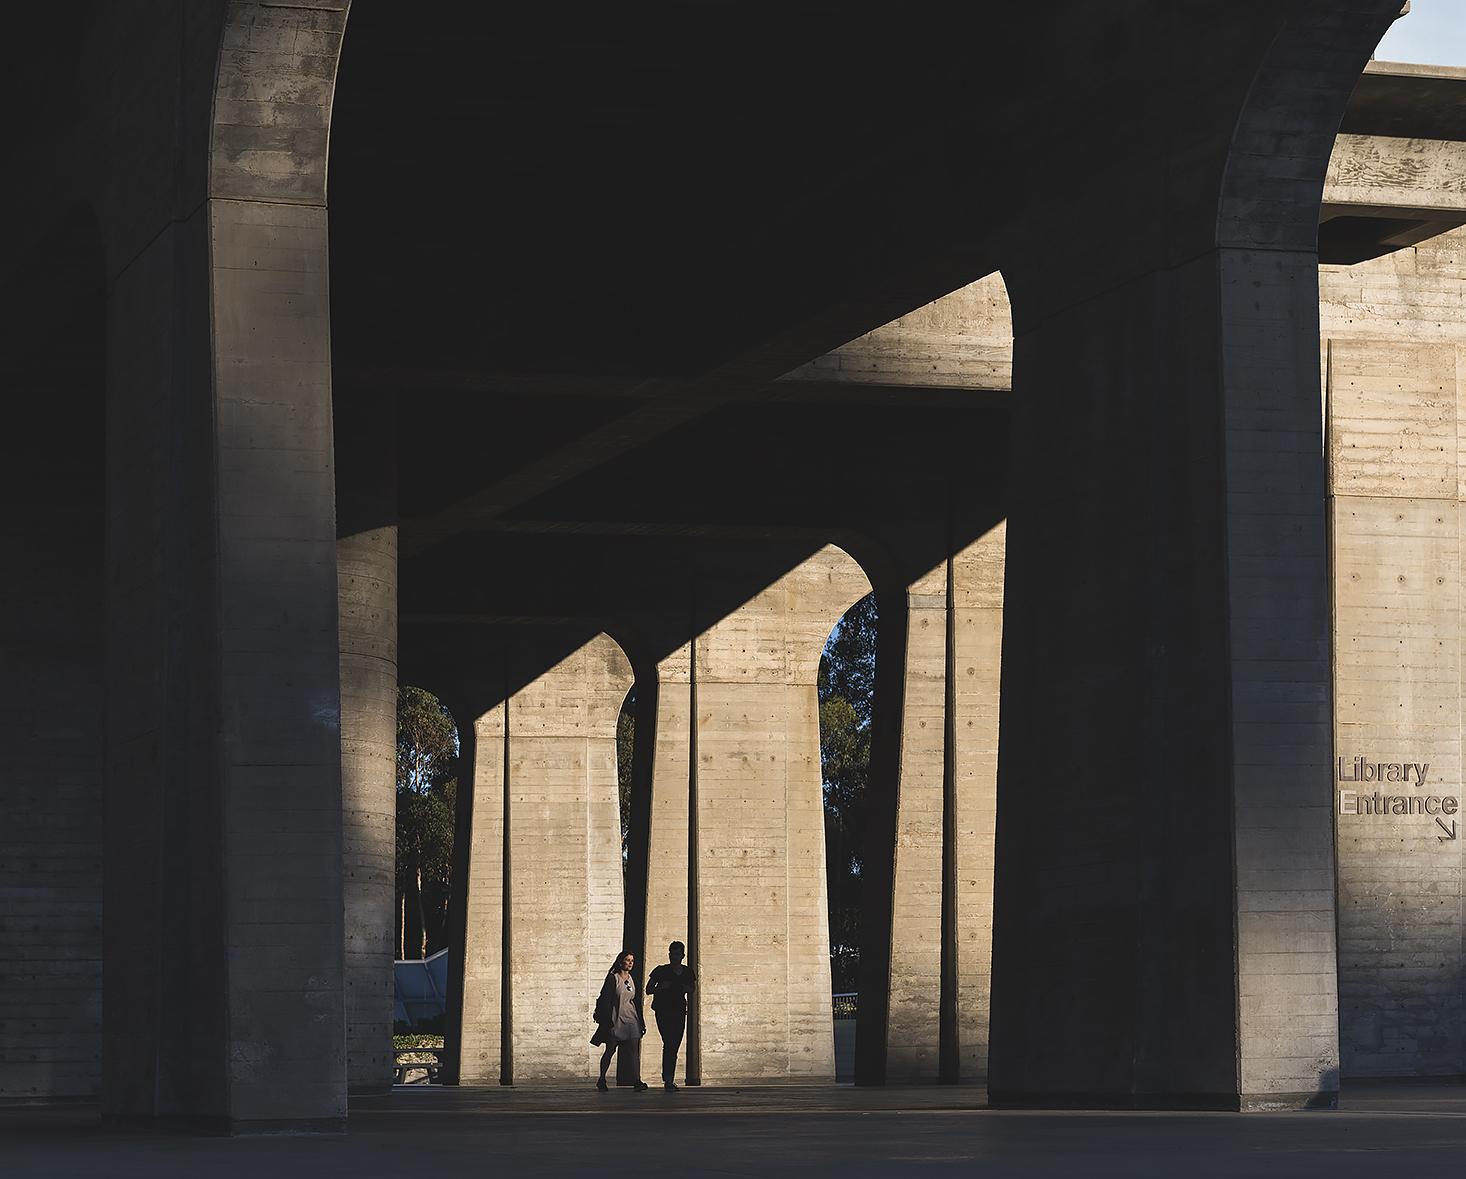 UCSD Geisel Library | La Jolla, CA